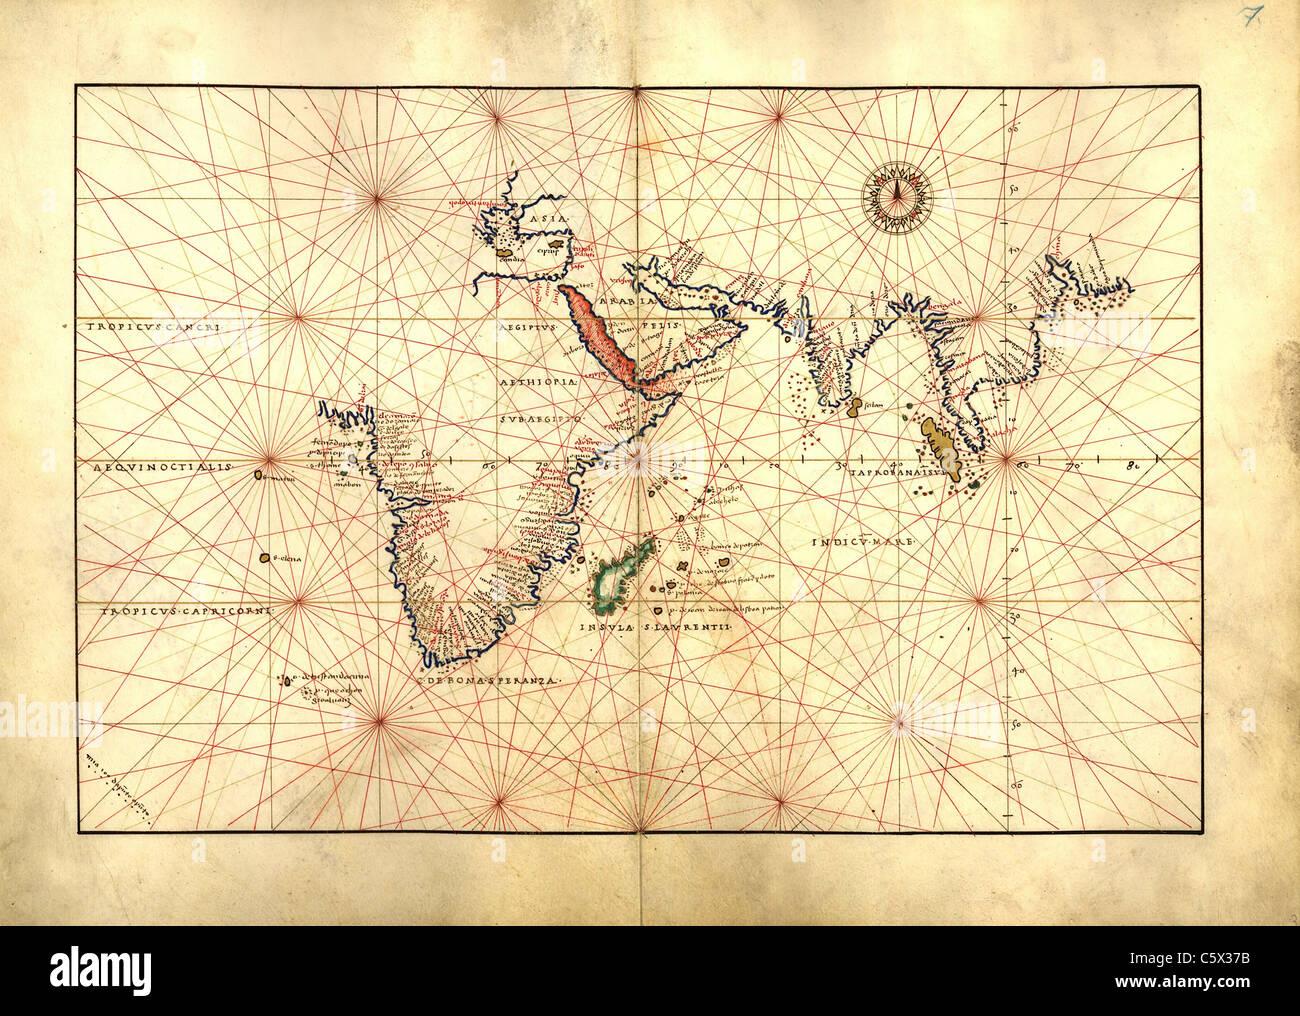 Indian Ocean - Antiquarian Map or Portolan Chart from 16th Century Portolan Atlas Stock Photo